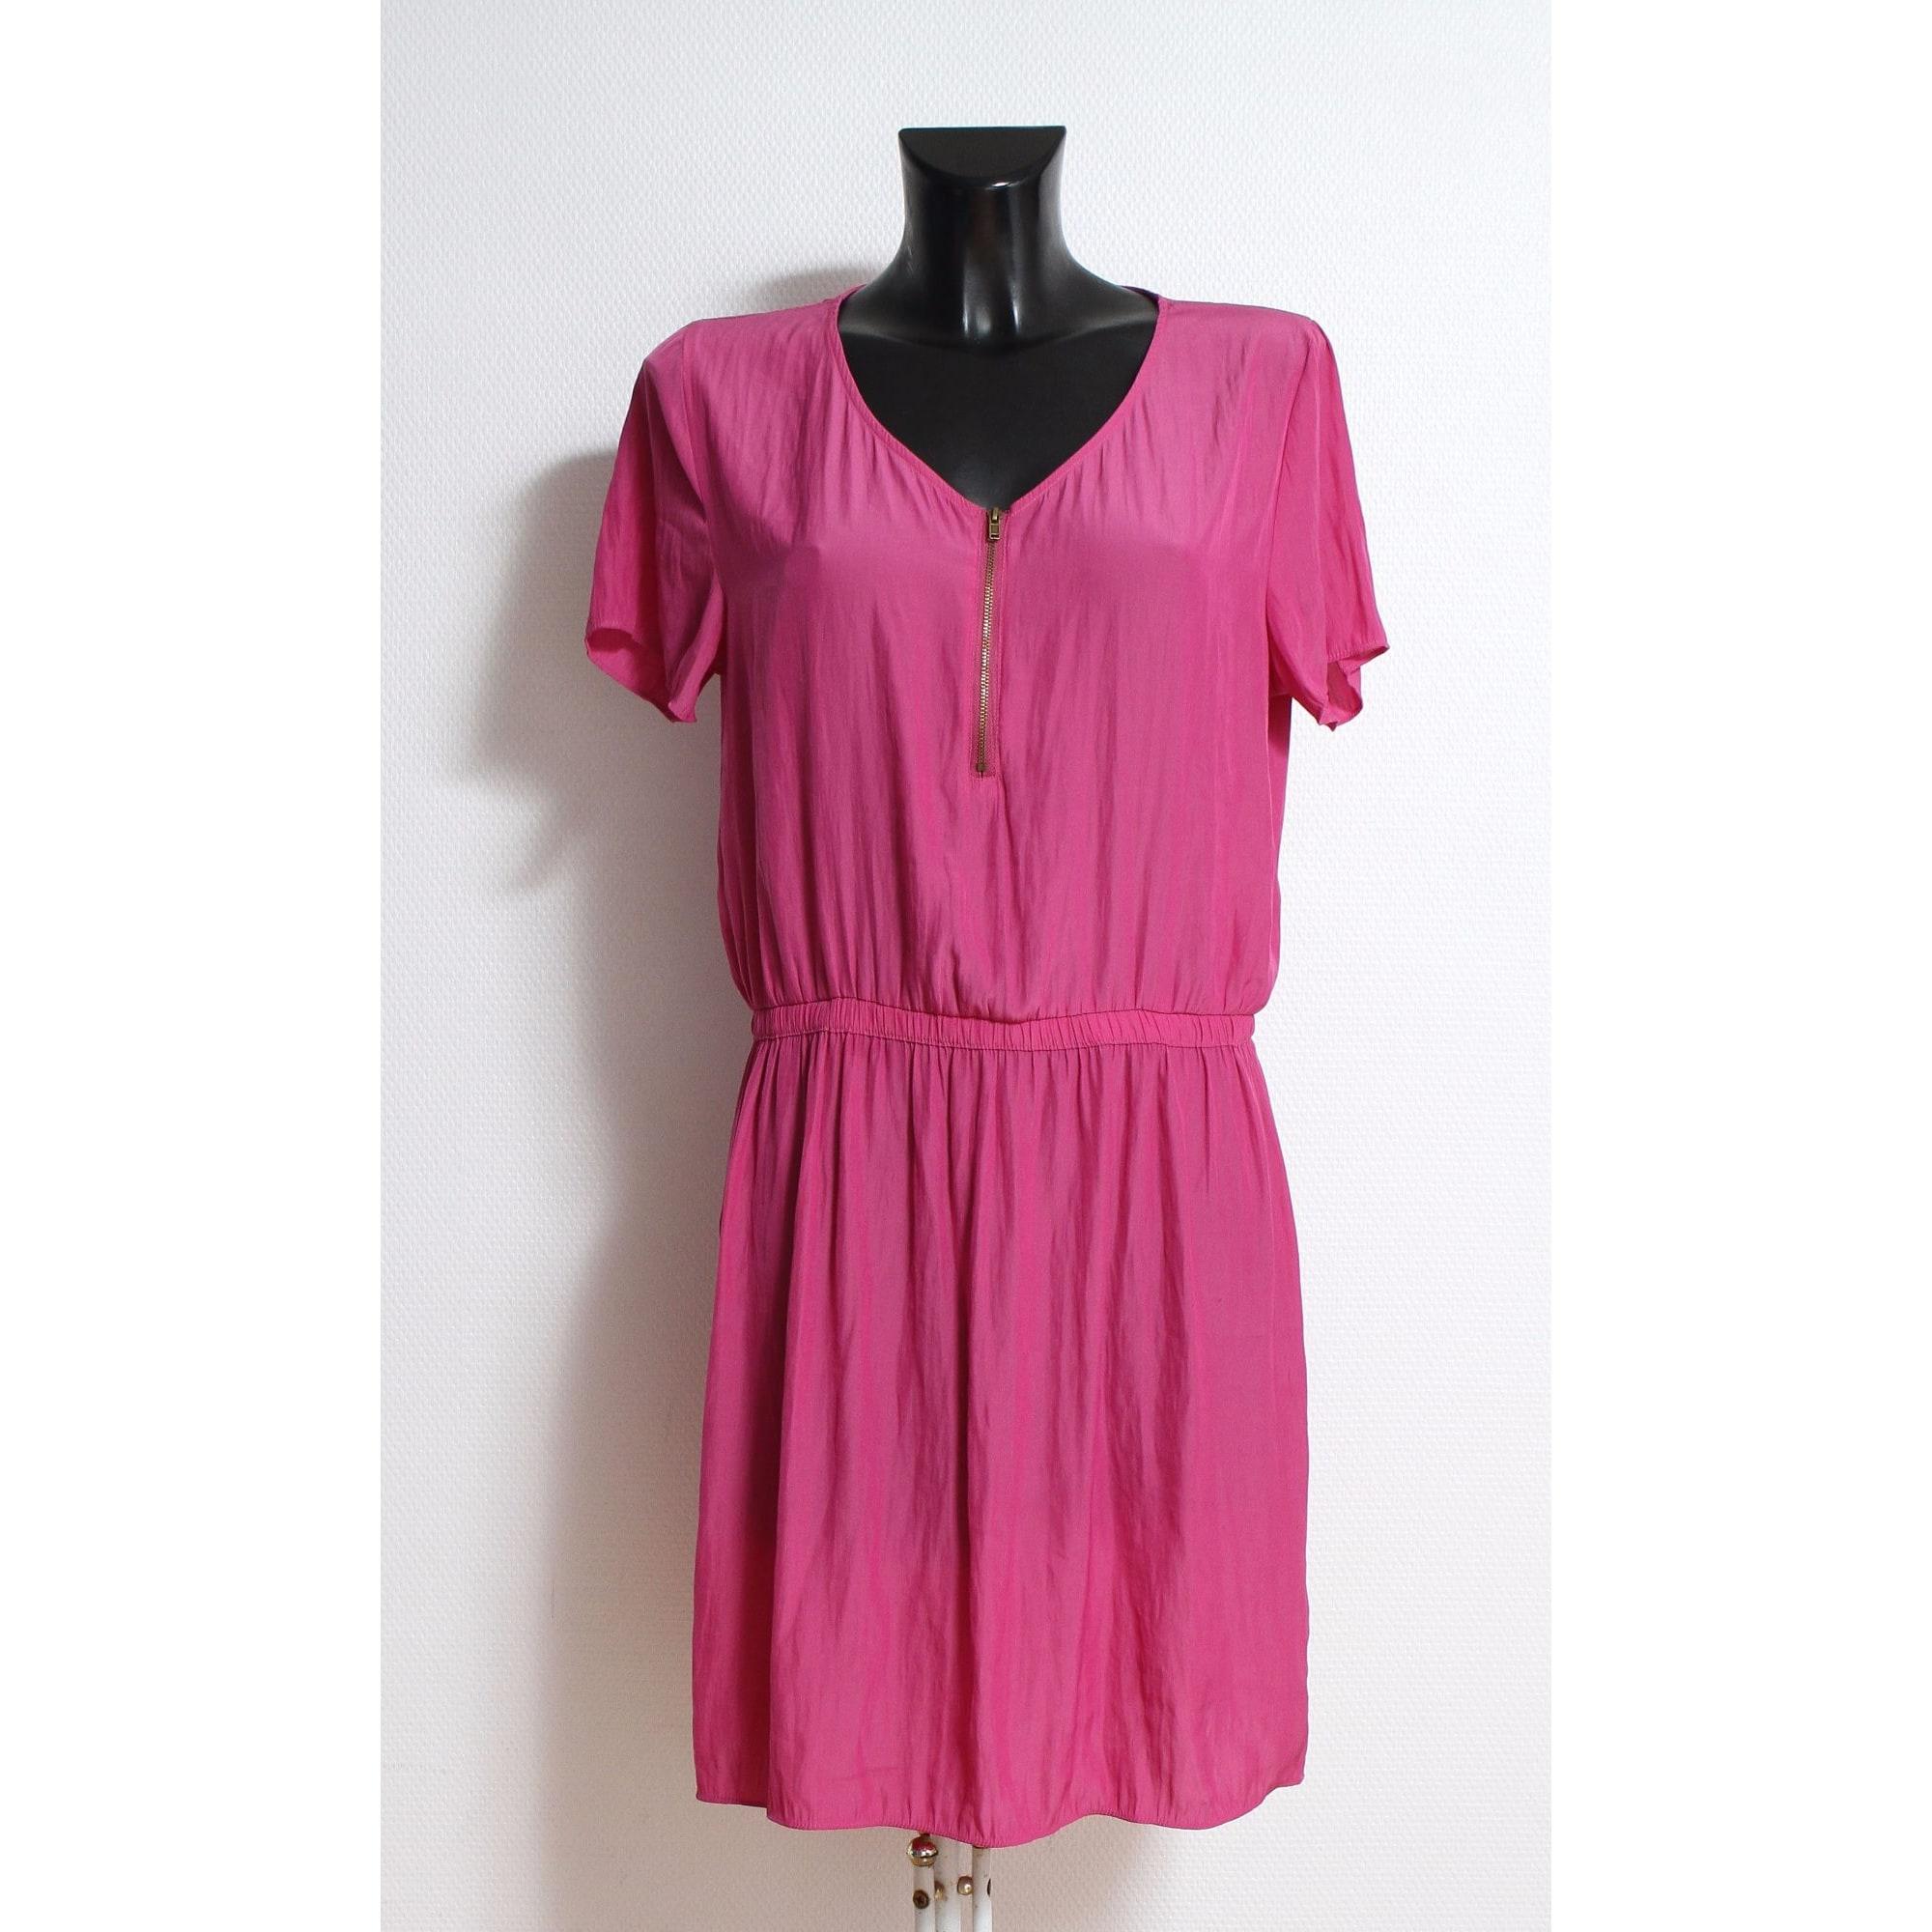 Robe mi-longue AMERICAN VINTAGE Rose, fuschia, vieux rose